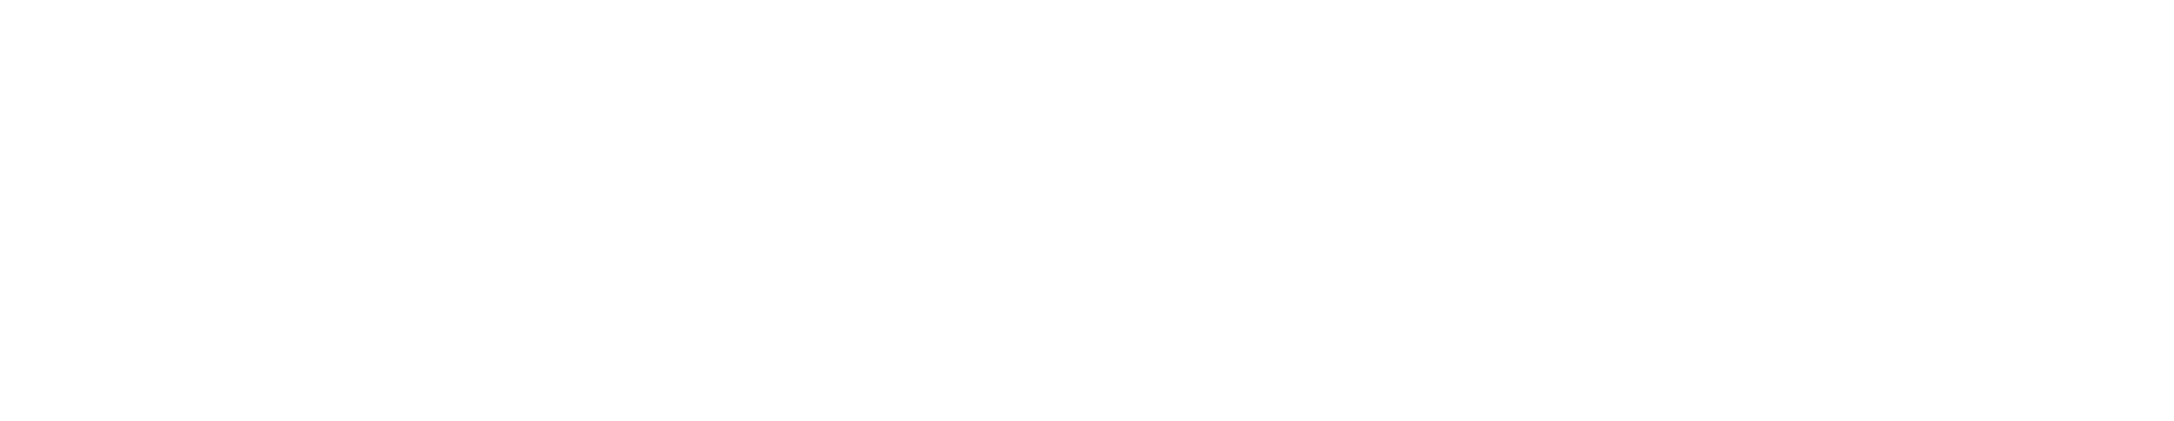 Envision Blockchain Solution | Blockchain Systems Integrator